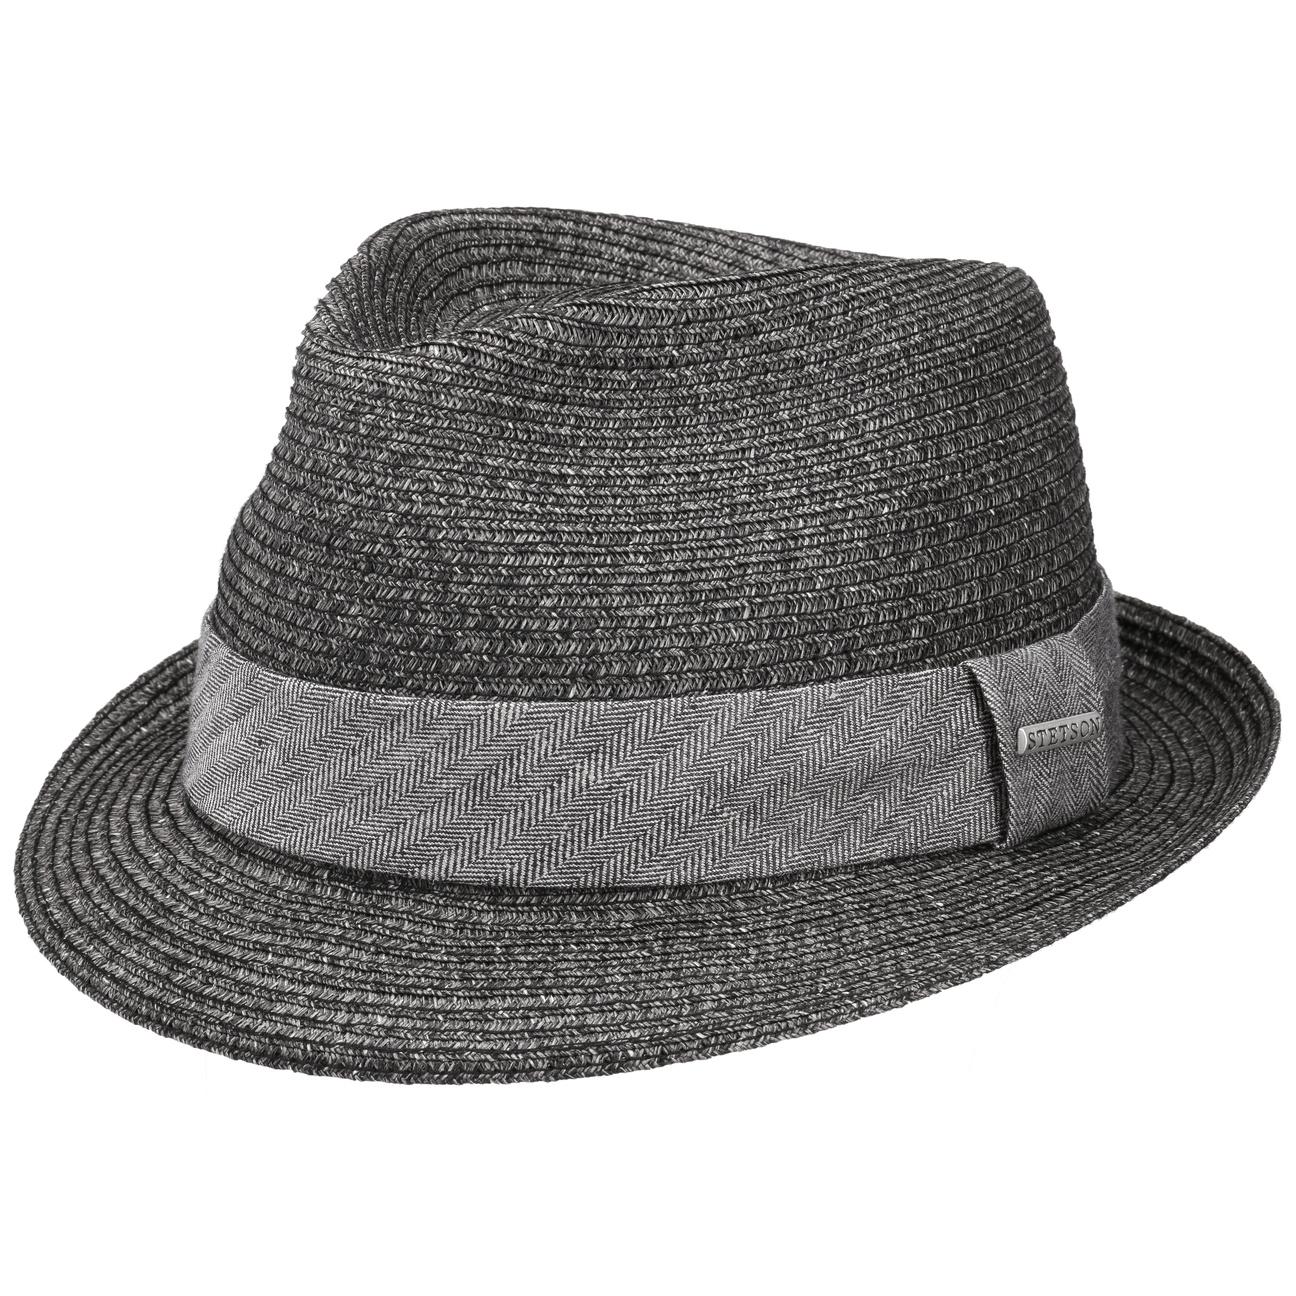 Reidton Toyo Trilby Straw Hat by Stetson  summer hat